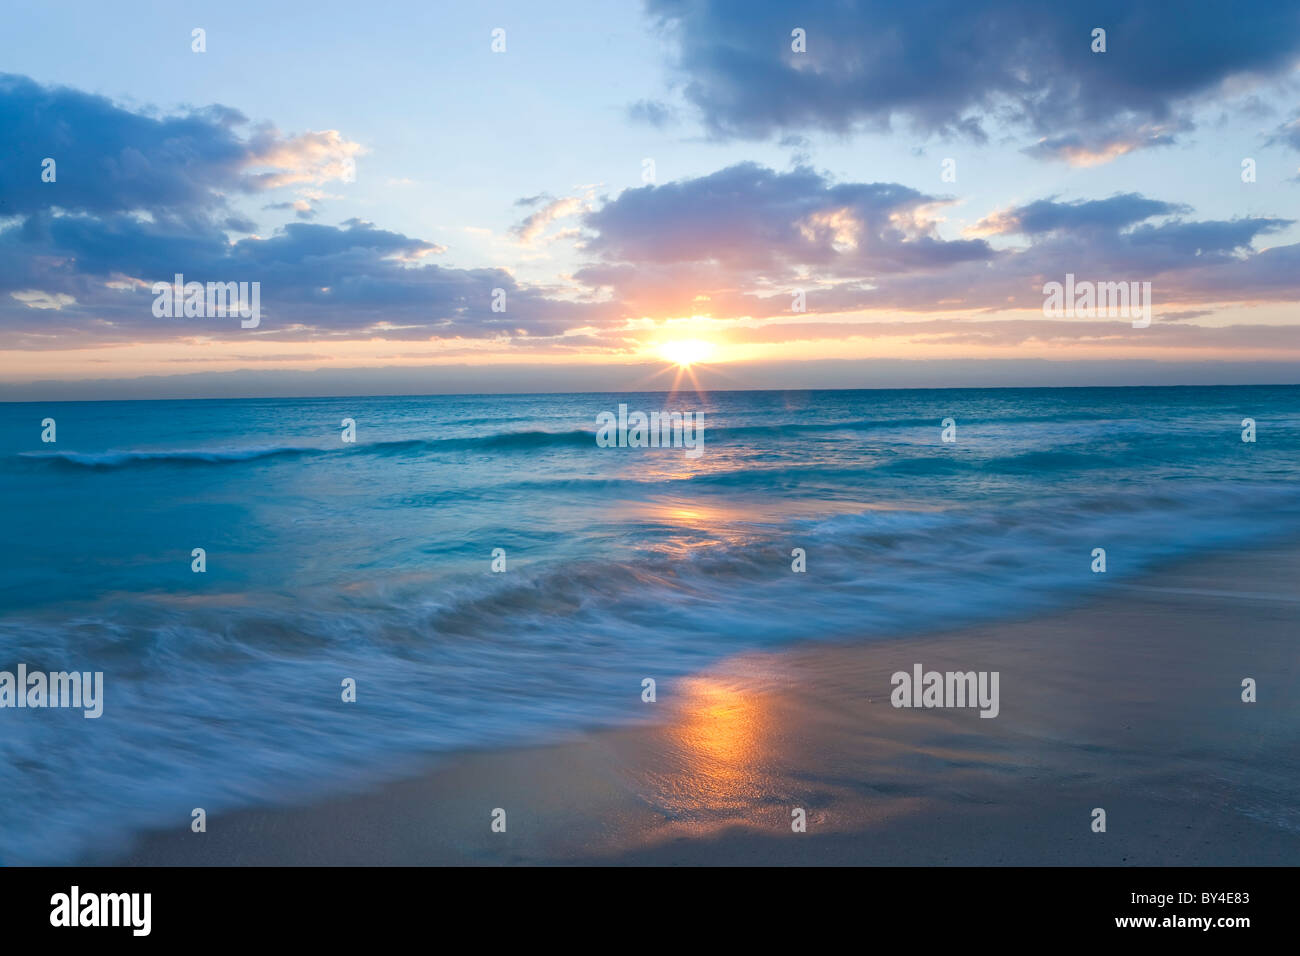 Sunrise, South Beach, Miami, Florida, USA - Stock Image